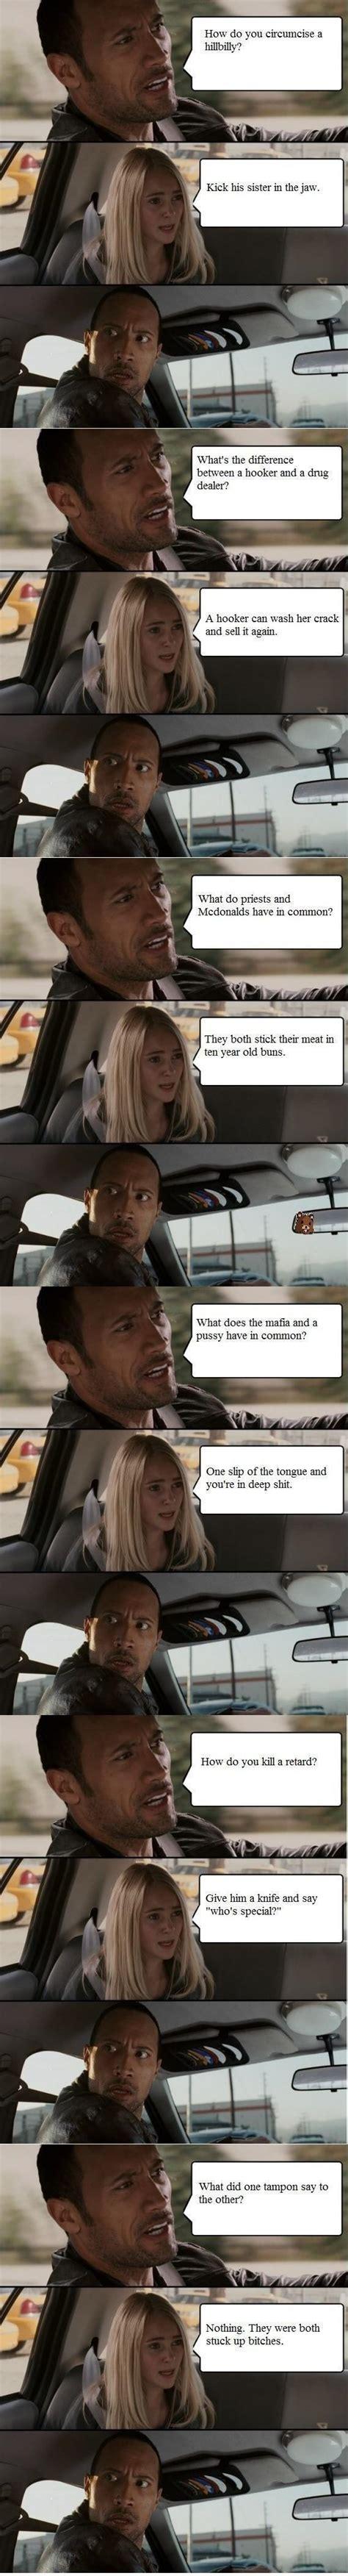 Witch Mountain Meme - race to witch mountain meme car trivia